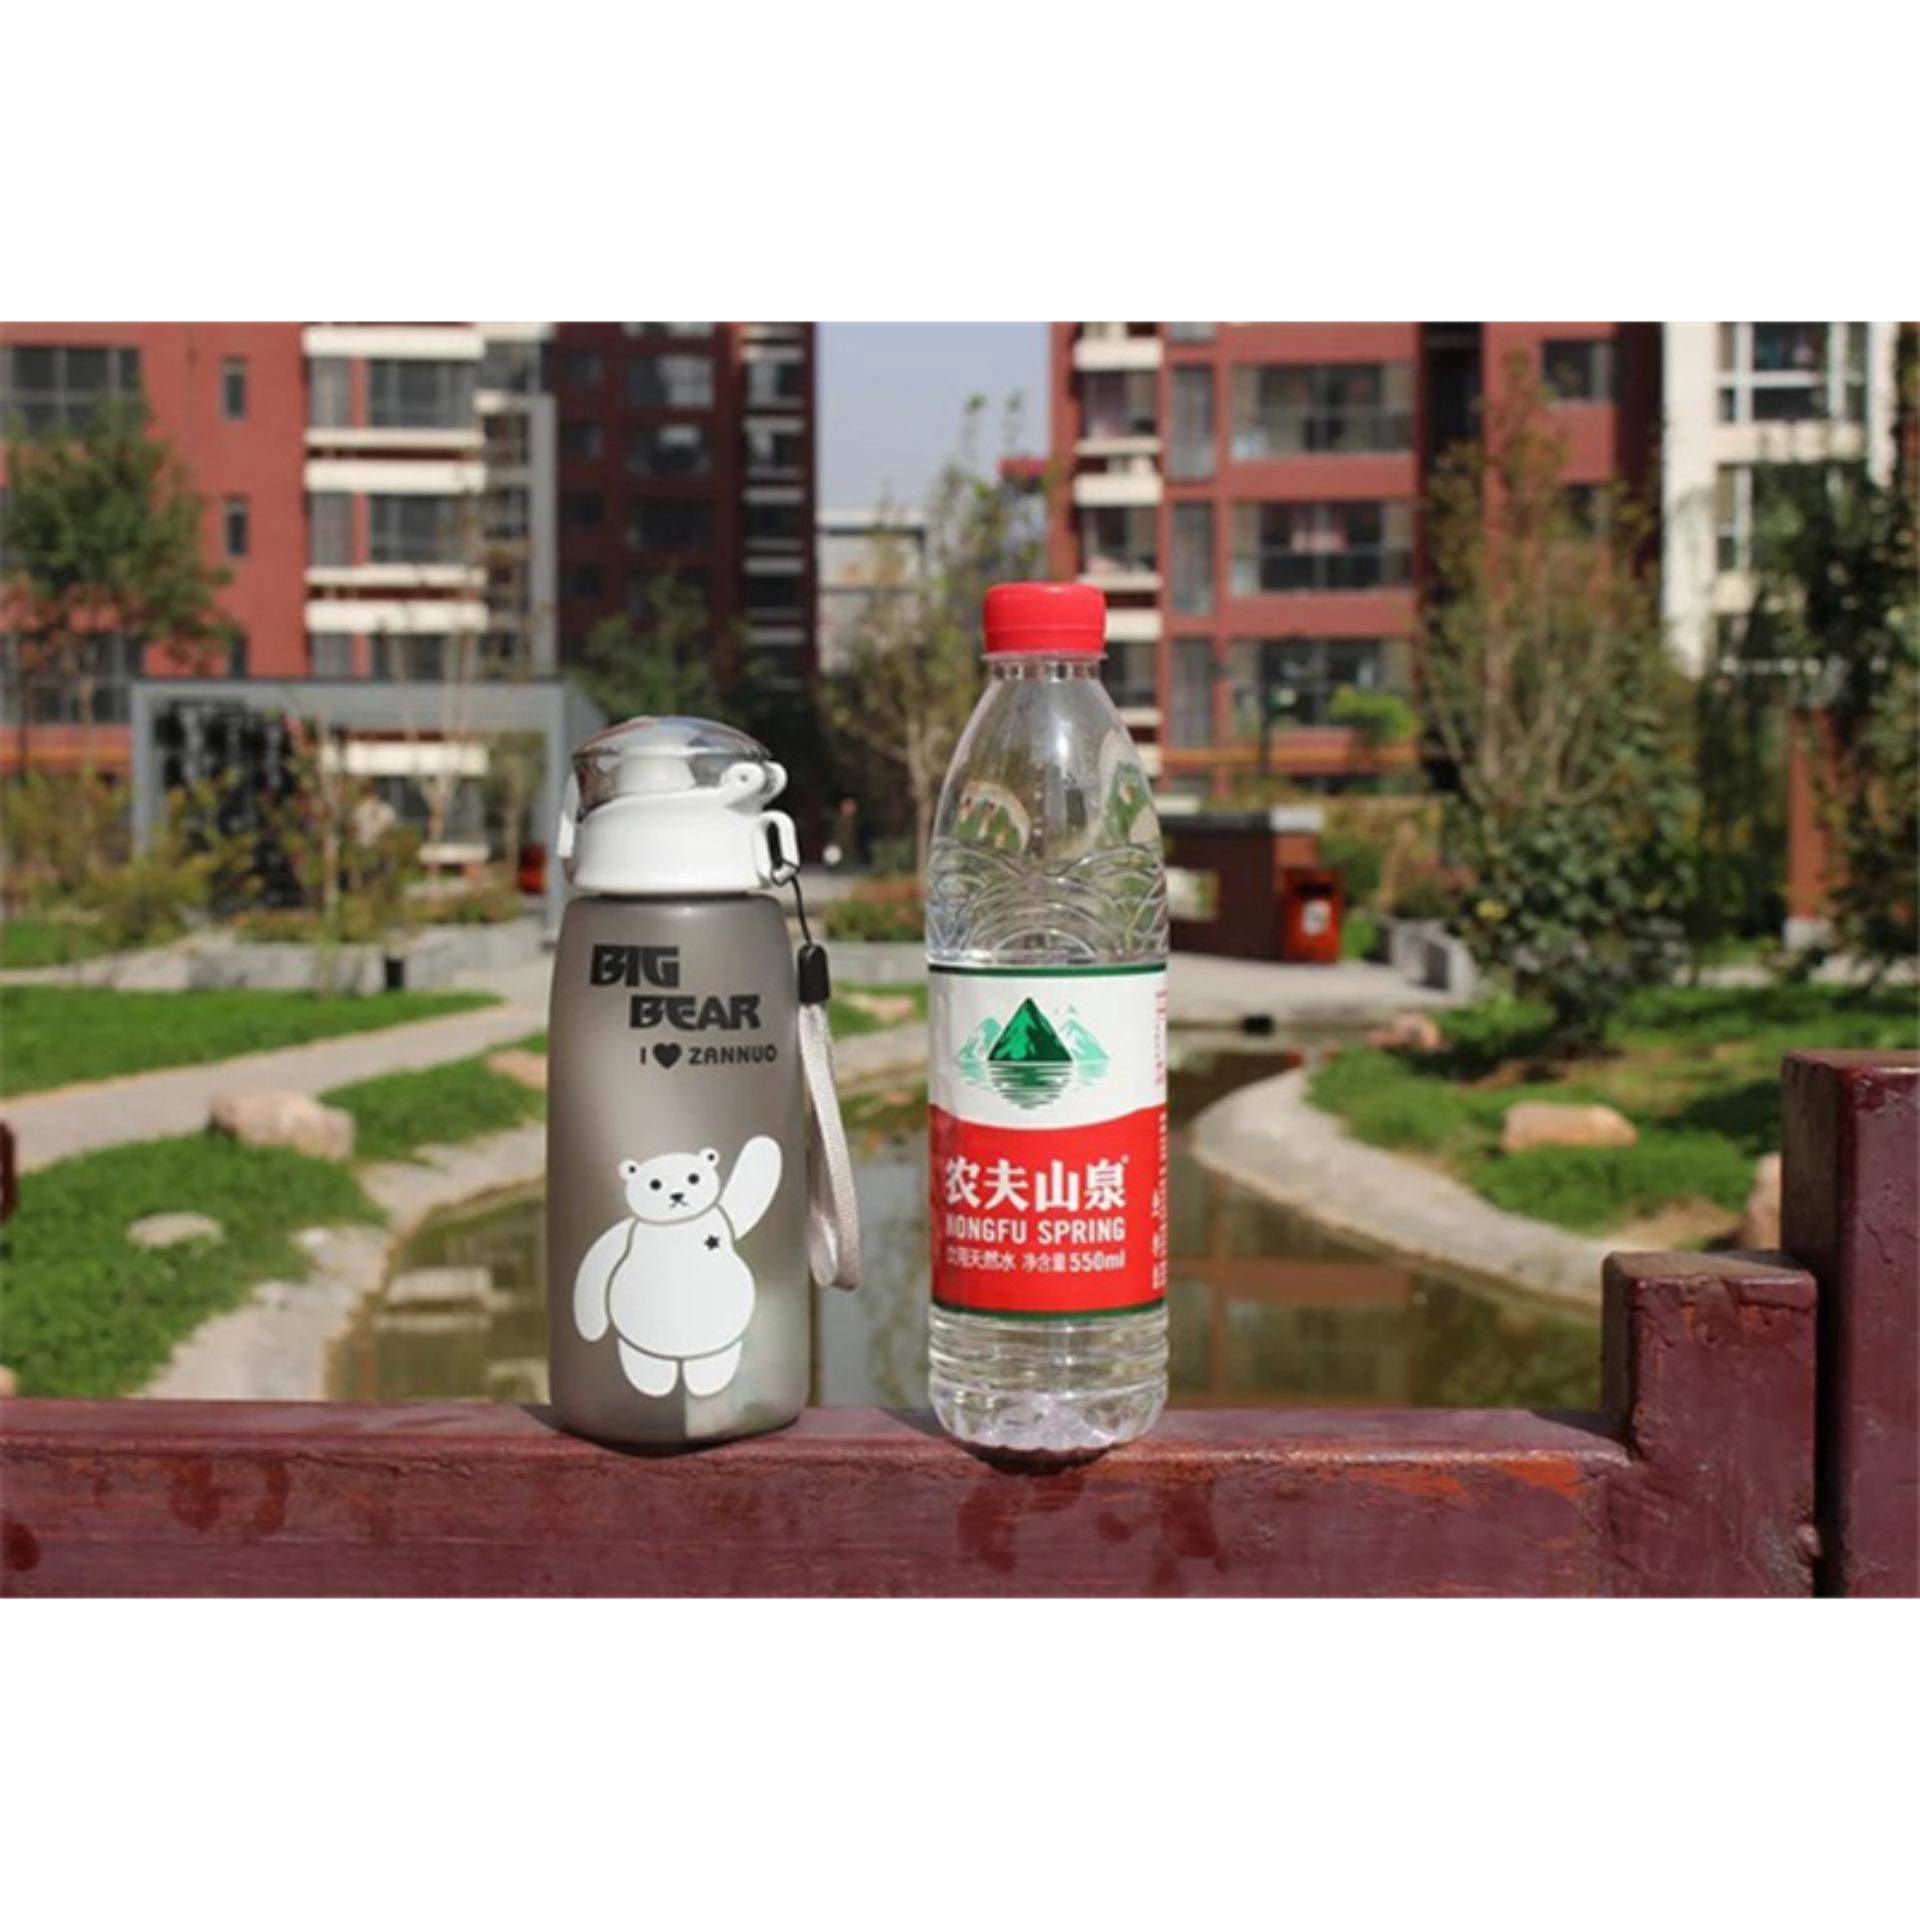 Cek Harga Baru Anabelle Botol Air Minum Unik Bpa Free Anti Tumpah Bottle Big Bear 500ml Murah